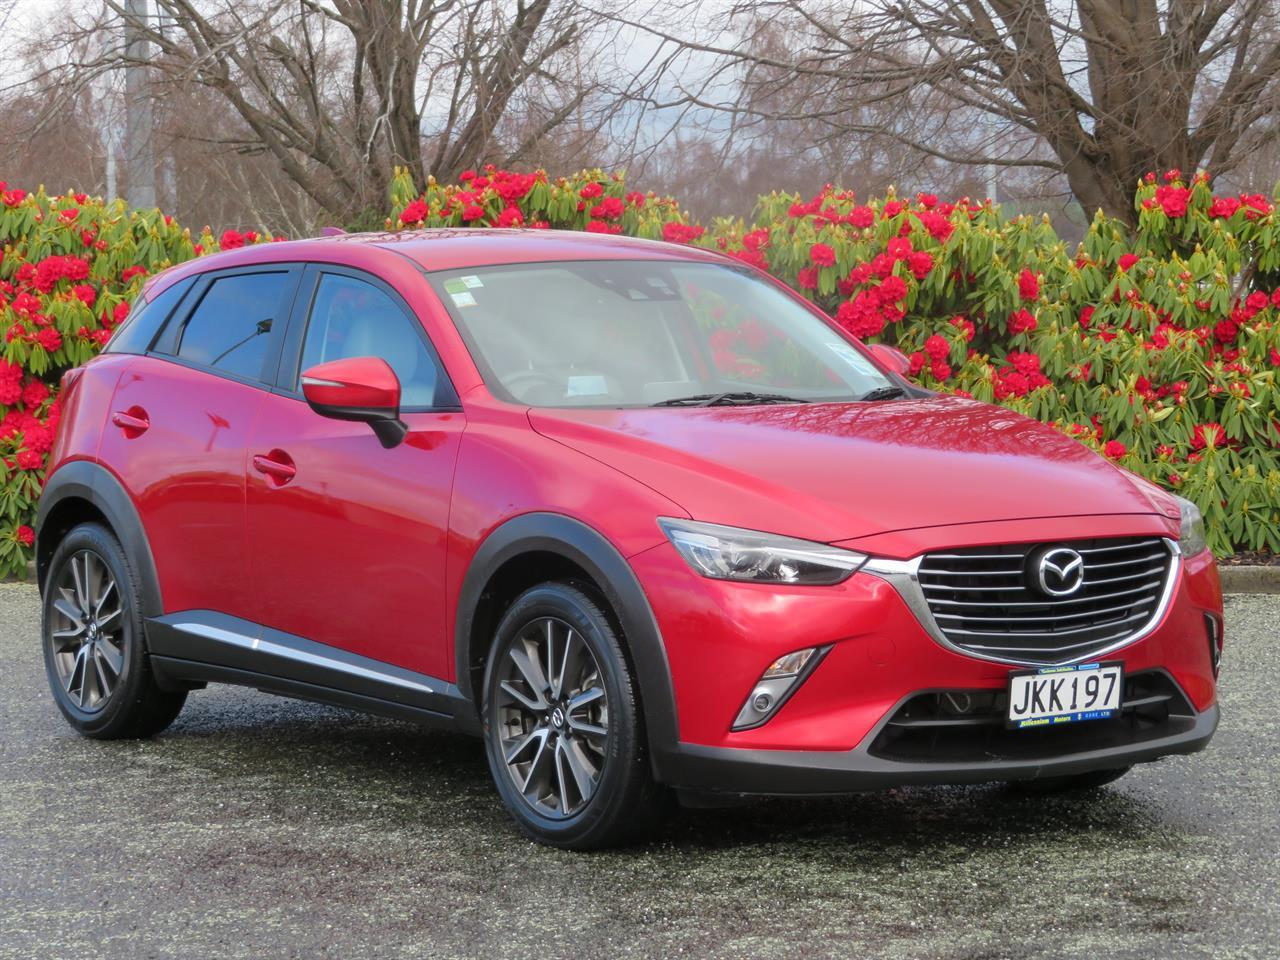 image-0, 2015 Mazda CX-3 LTD AWD at Gore